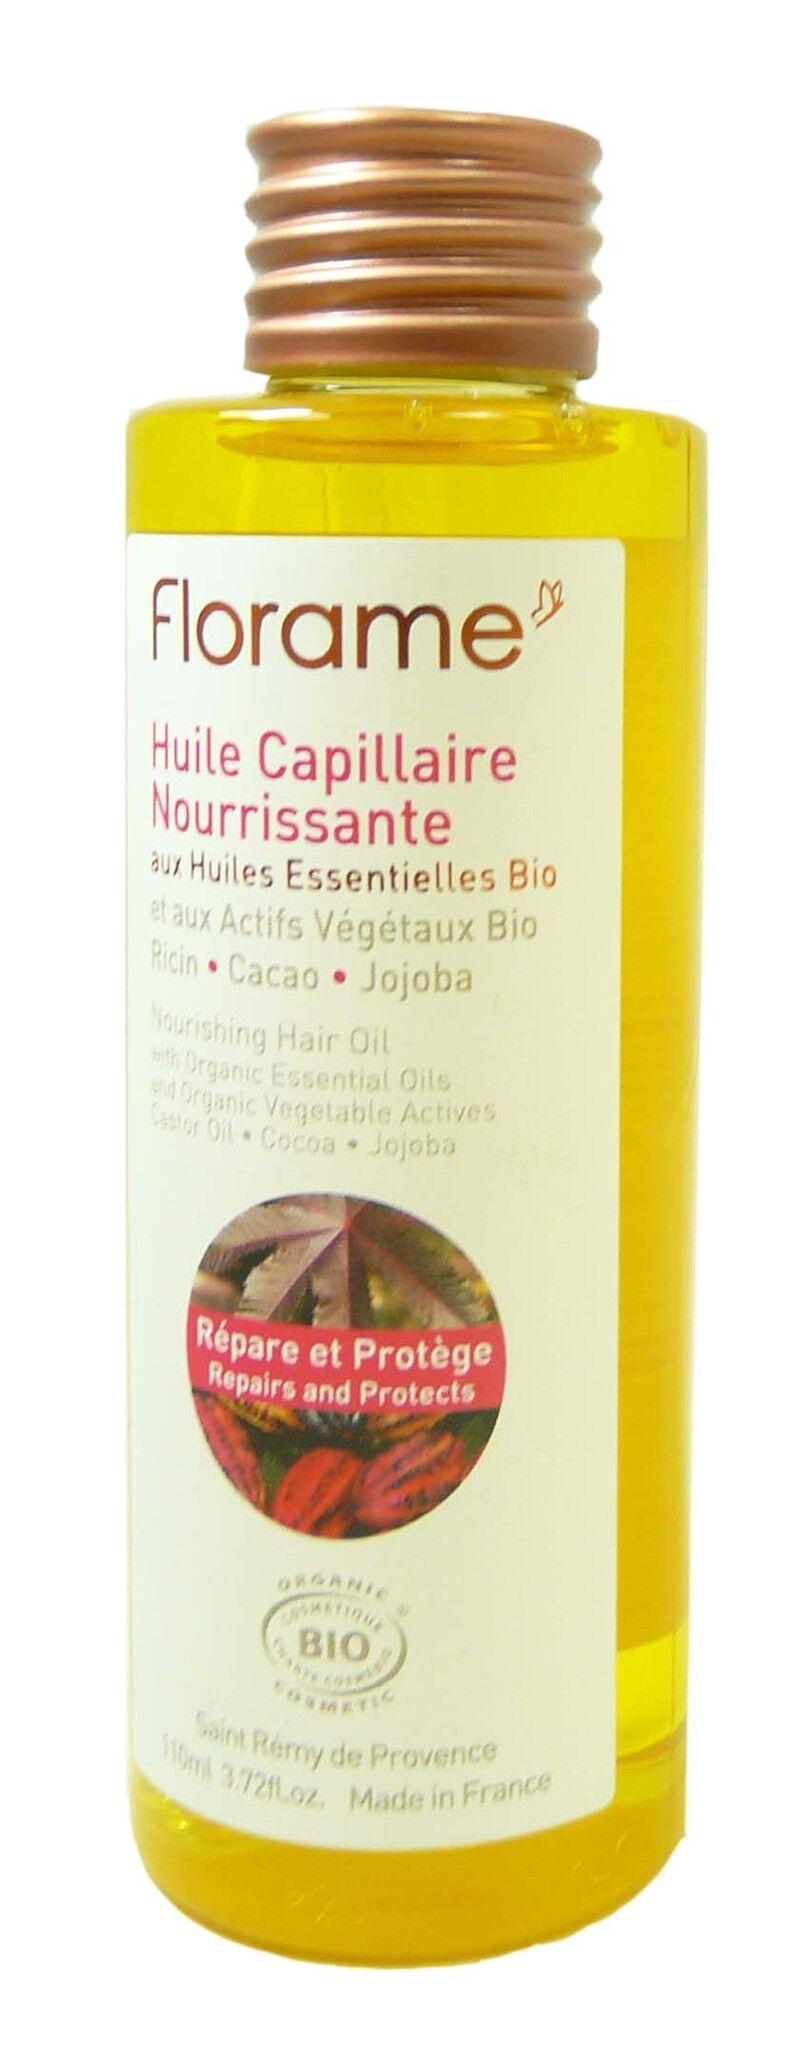 Florame huile capillaire nourrissante 110ml